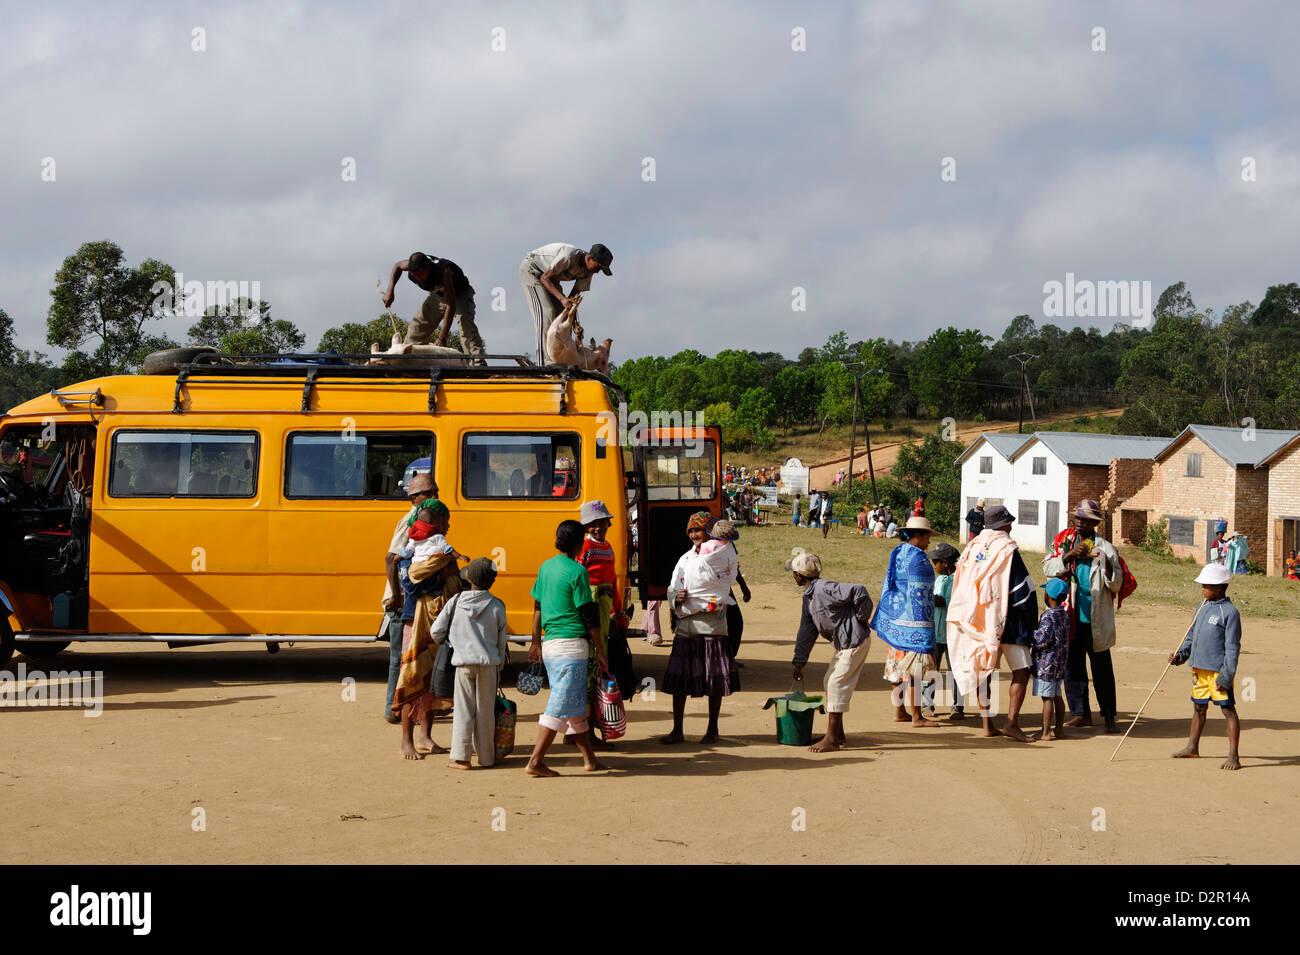 Bush taxi, Friday market in the Betsileo country, around Fianarantsoa, Madagascar, Africa - Stock Image